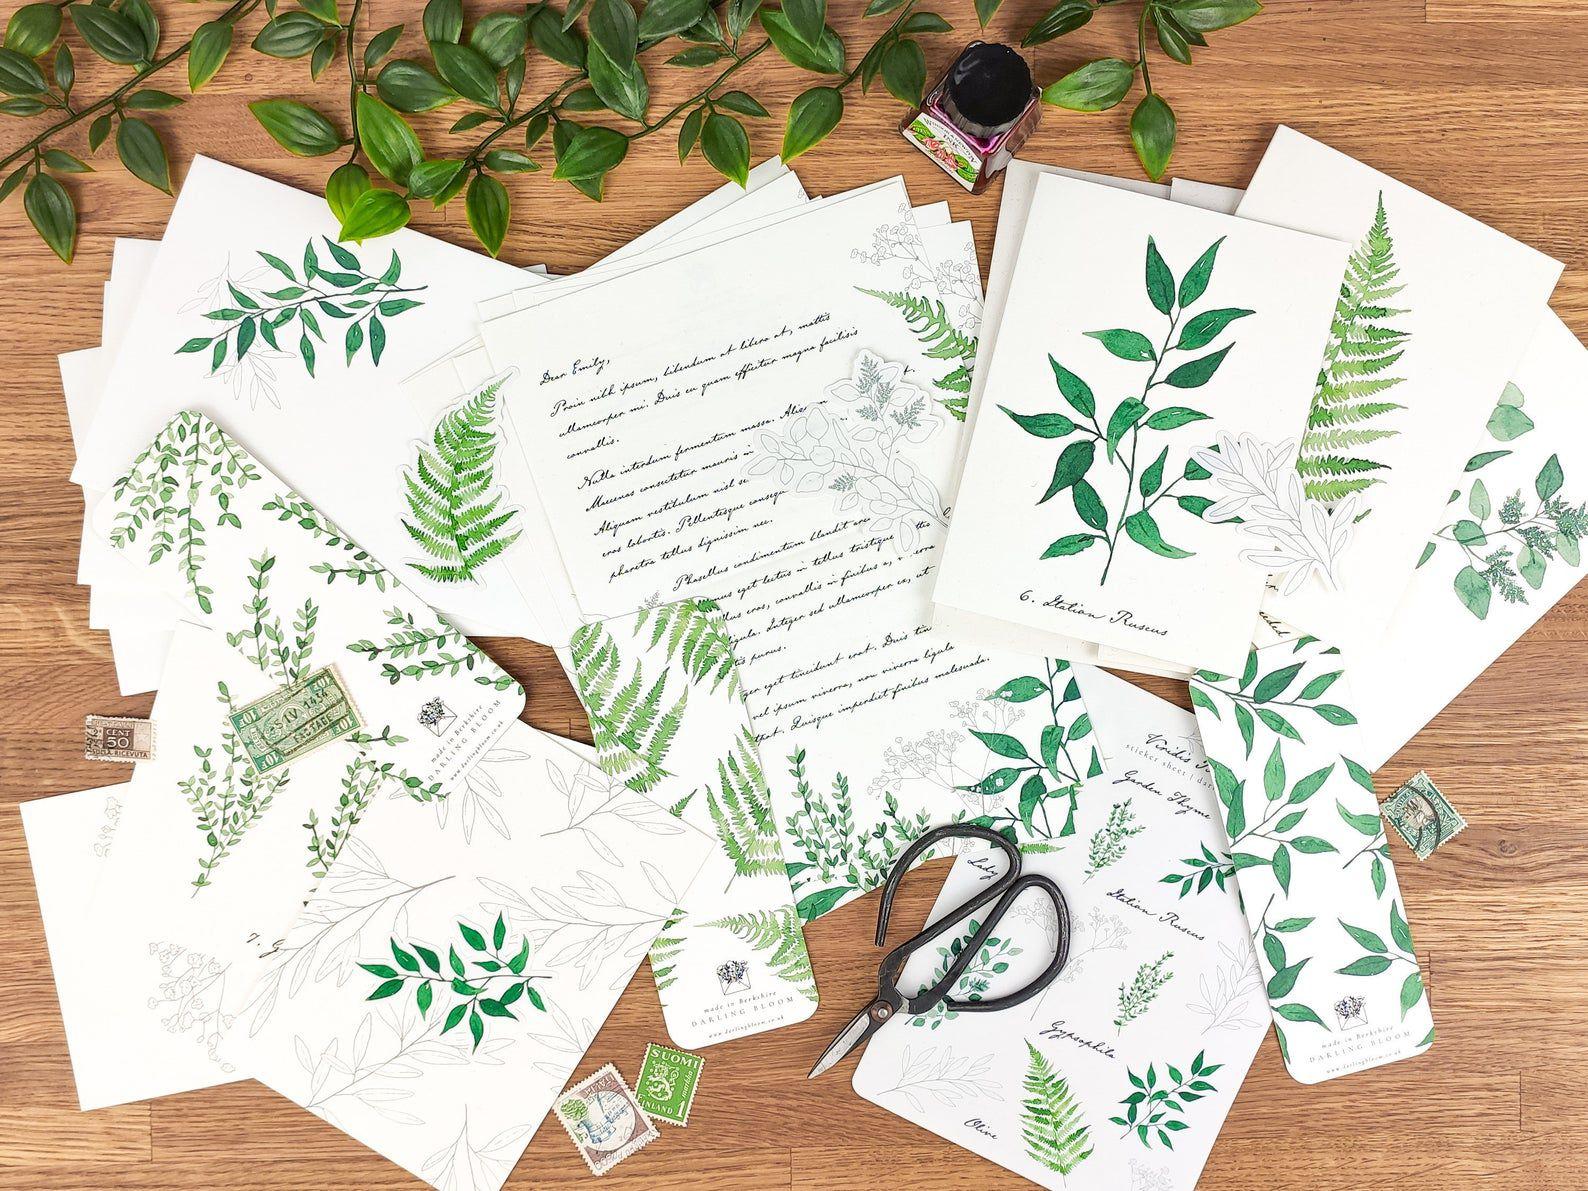 Leaf-printed paper and envelopes.